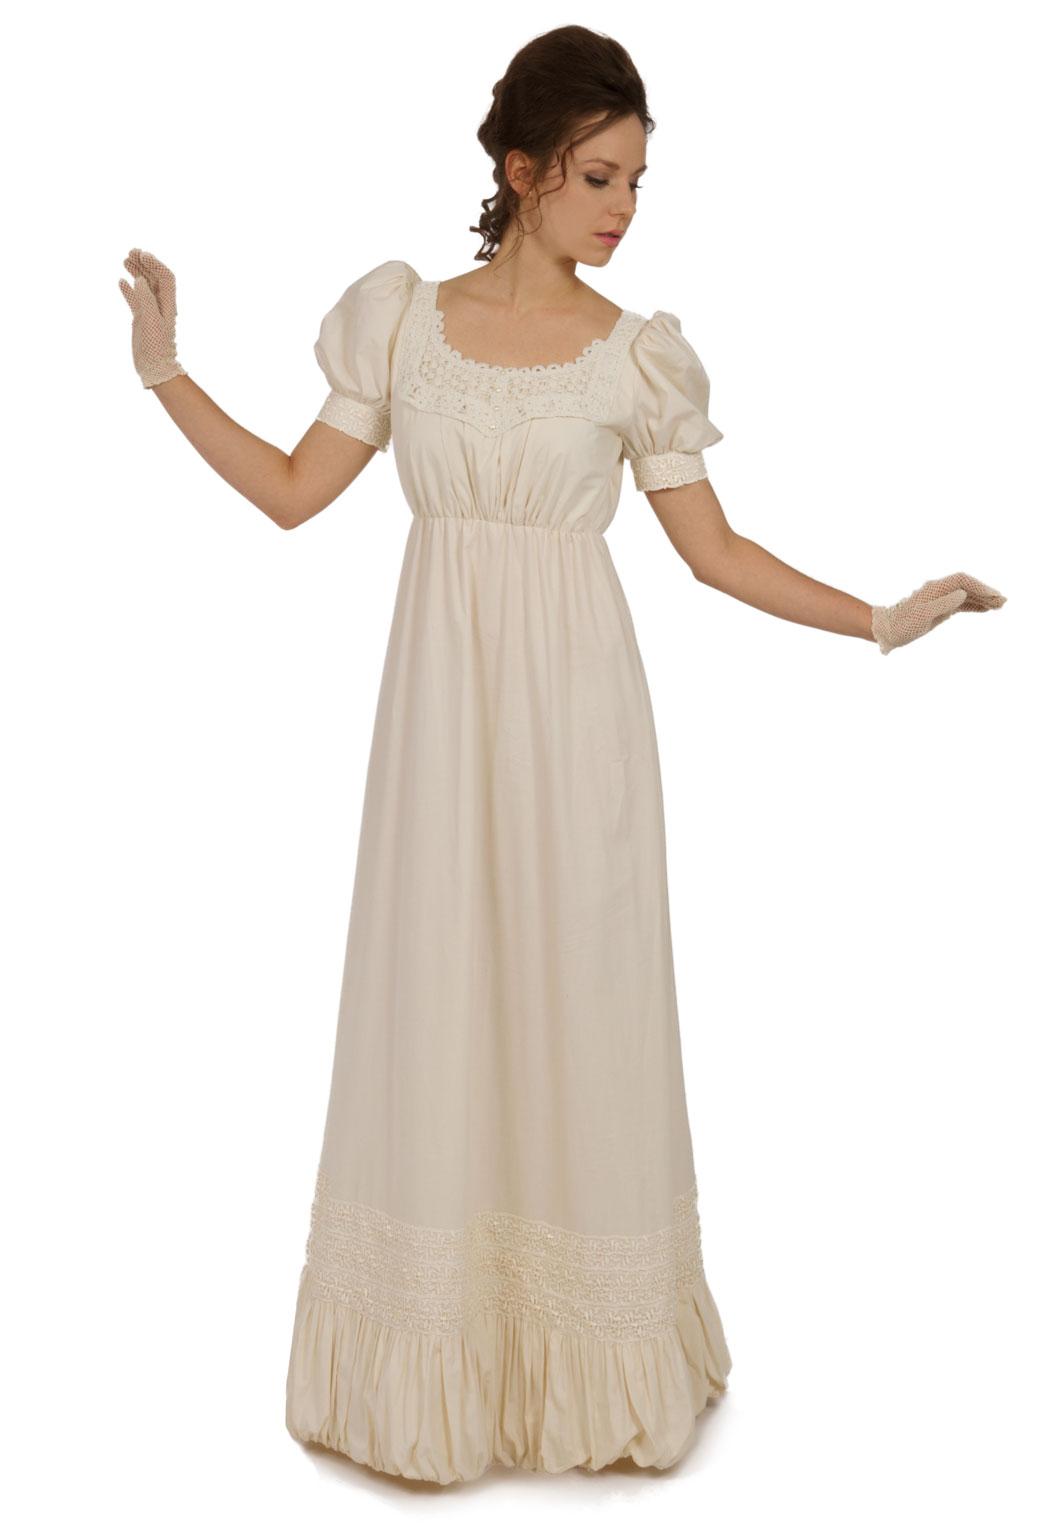 Azalea Regency Gown | Recollections